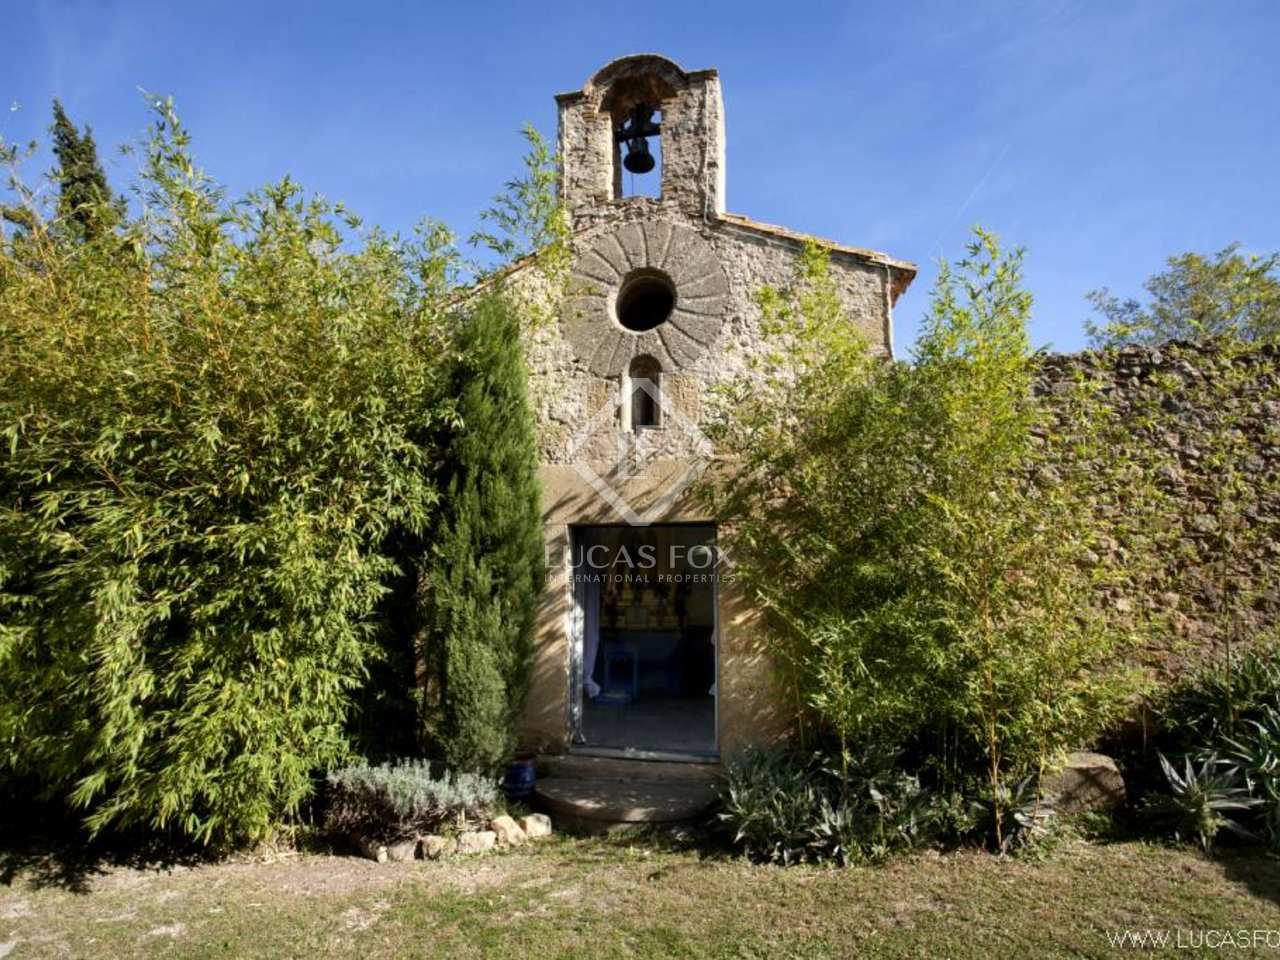 Riverside Property For Sale Spain